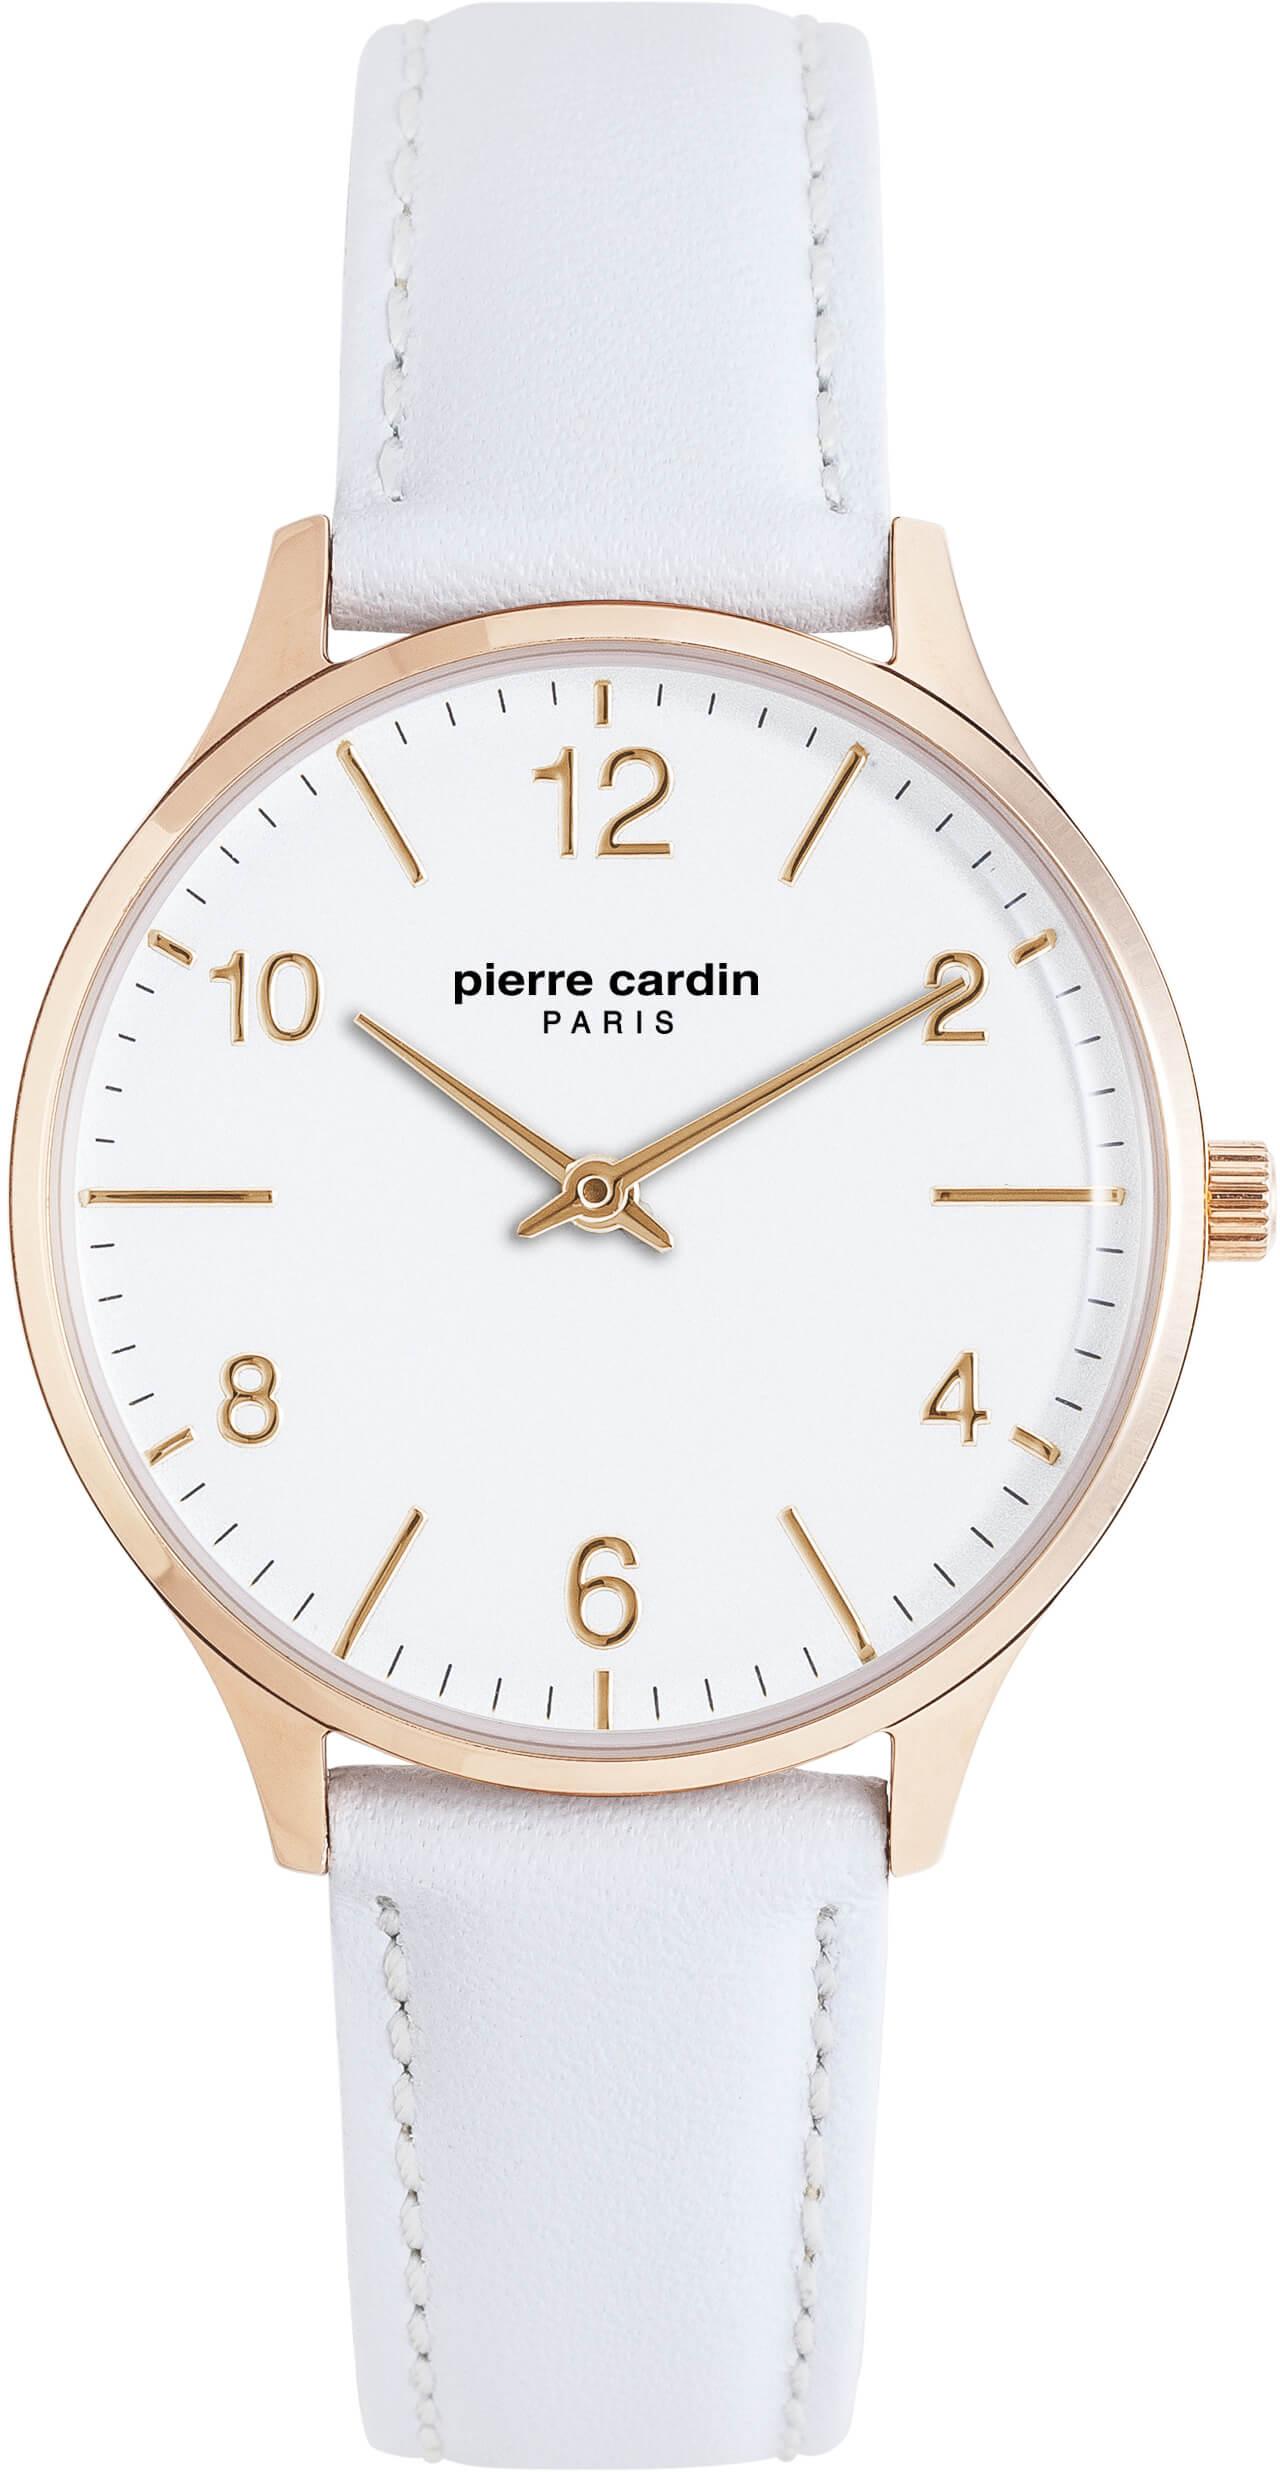 Pierre Cardin La Gloire PC902722F107 Doprava ZDARMA  13f2dd48db1